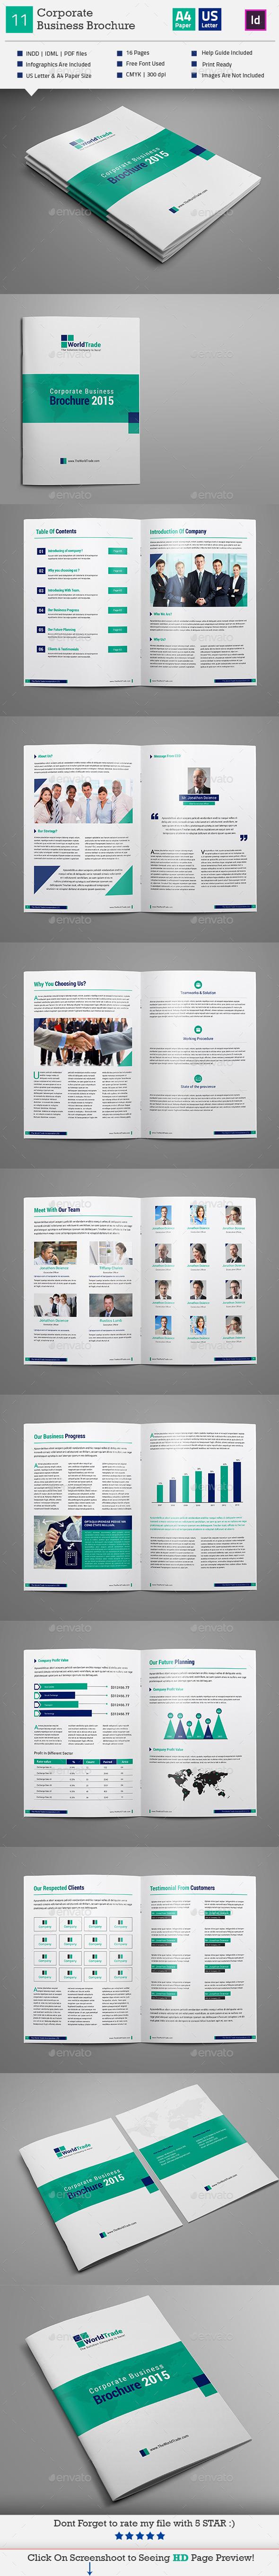 GraphicRiver Corporate Business Brochure Indesign V11 11268479